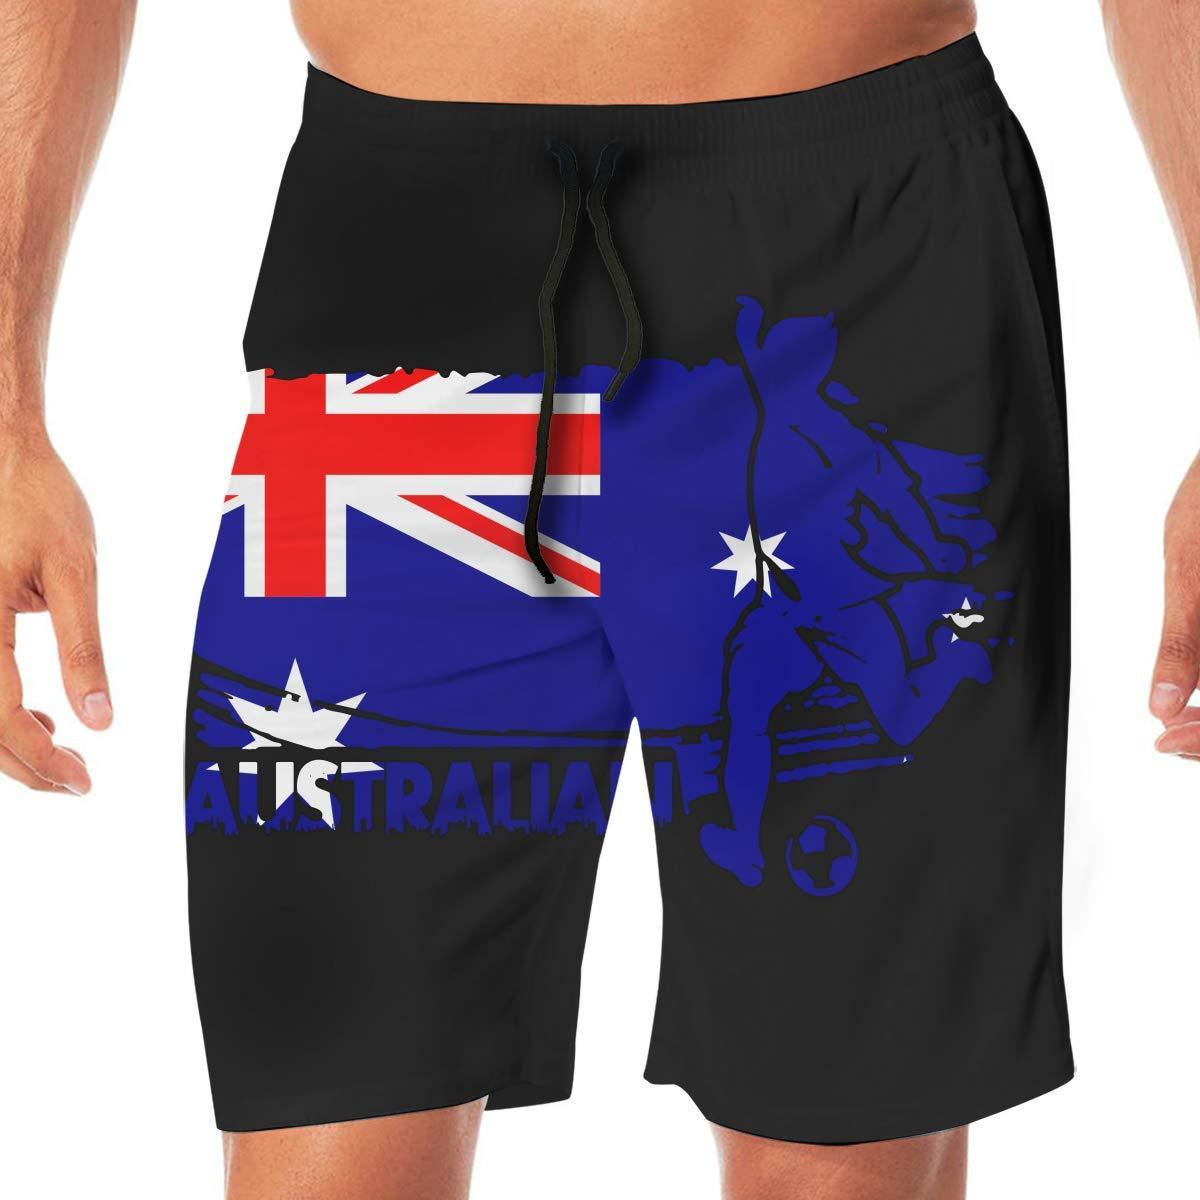 GHYGTY New Zealand Flag Soccer Football11 Mens Swim Trunks Board Shorts Swimming Trunks Sports Pants for Jogging